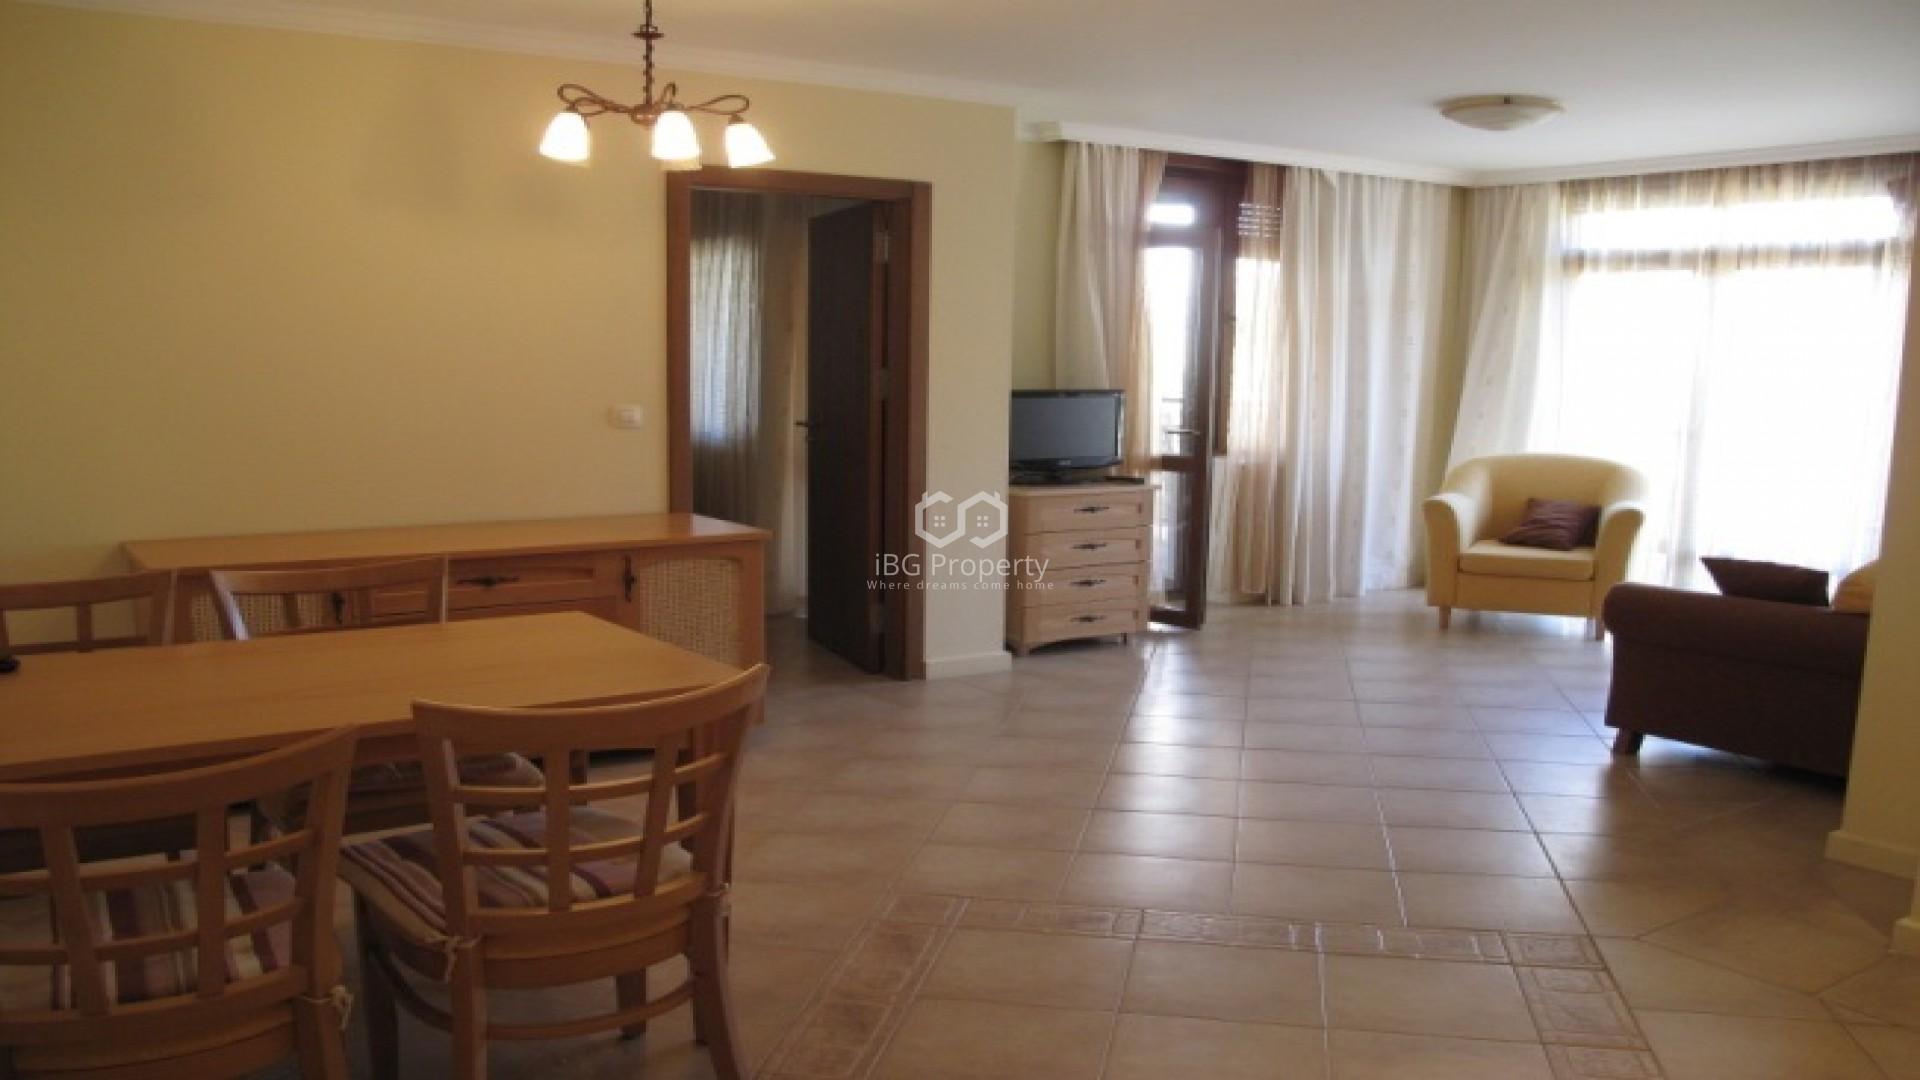 One bedroom apartment Sozopol 60 m2